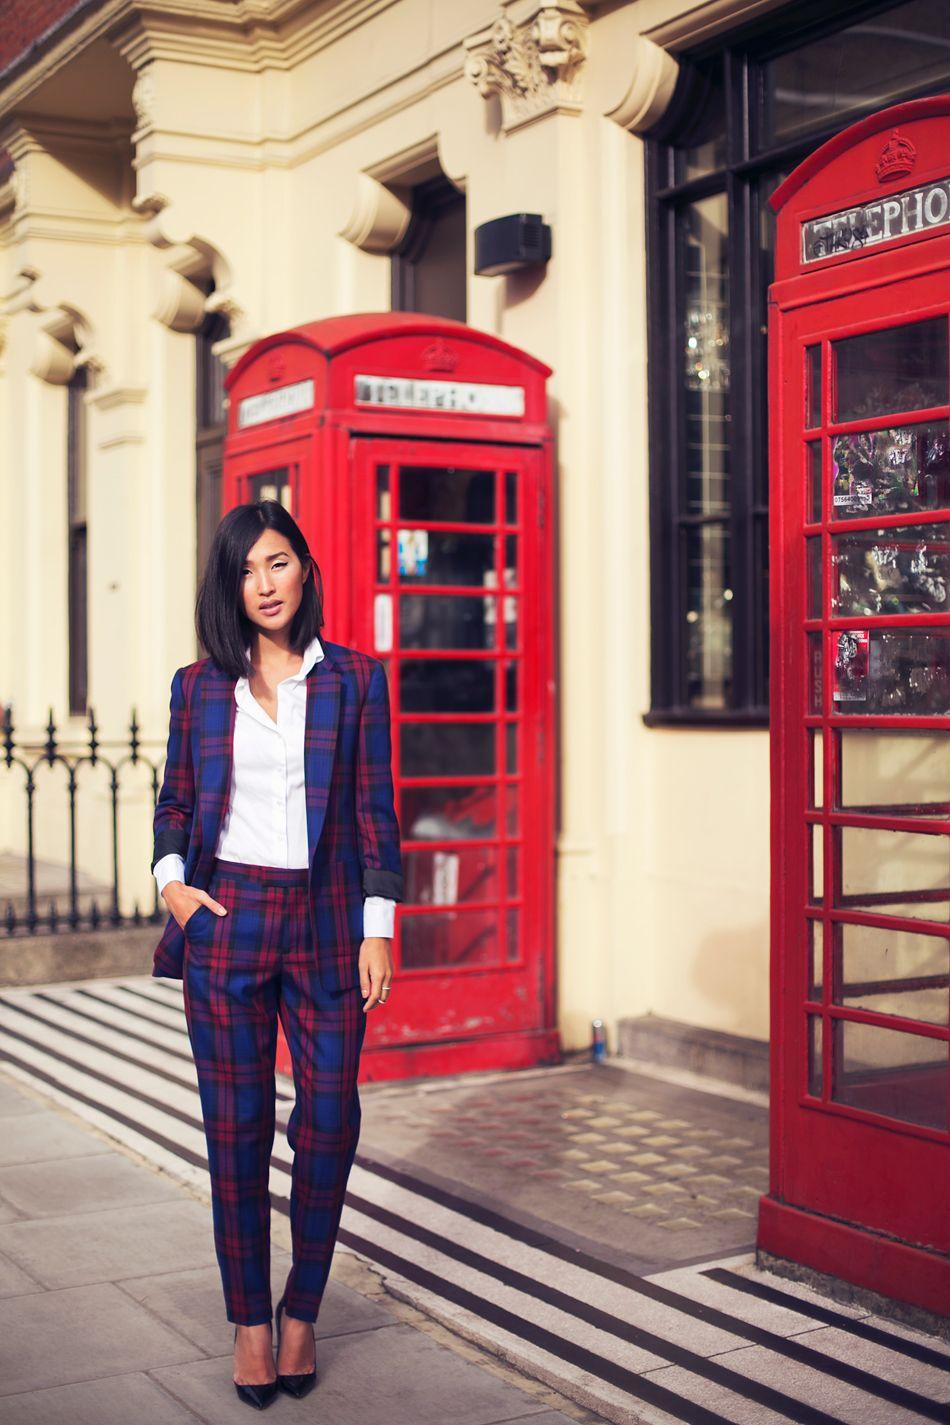 Stilsicher in London: Bloggerin Gary Pepper Girl im Tartan-Hosenanzug #blogger #streetstyle